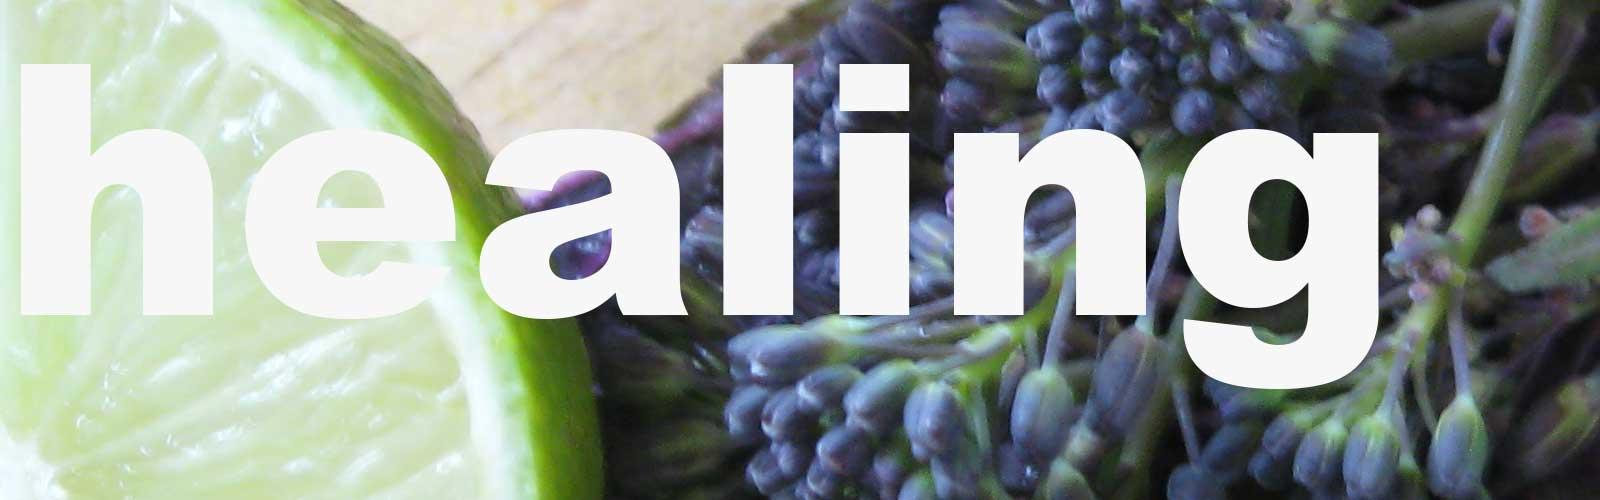 contact herbalist, nutritionist